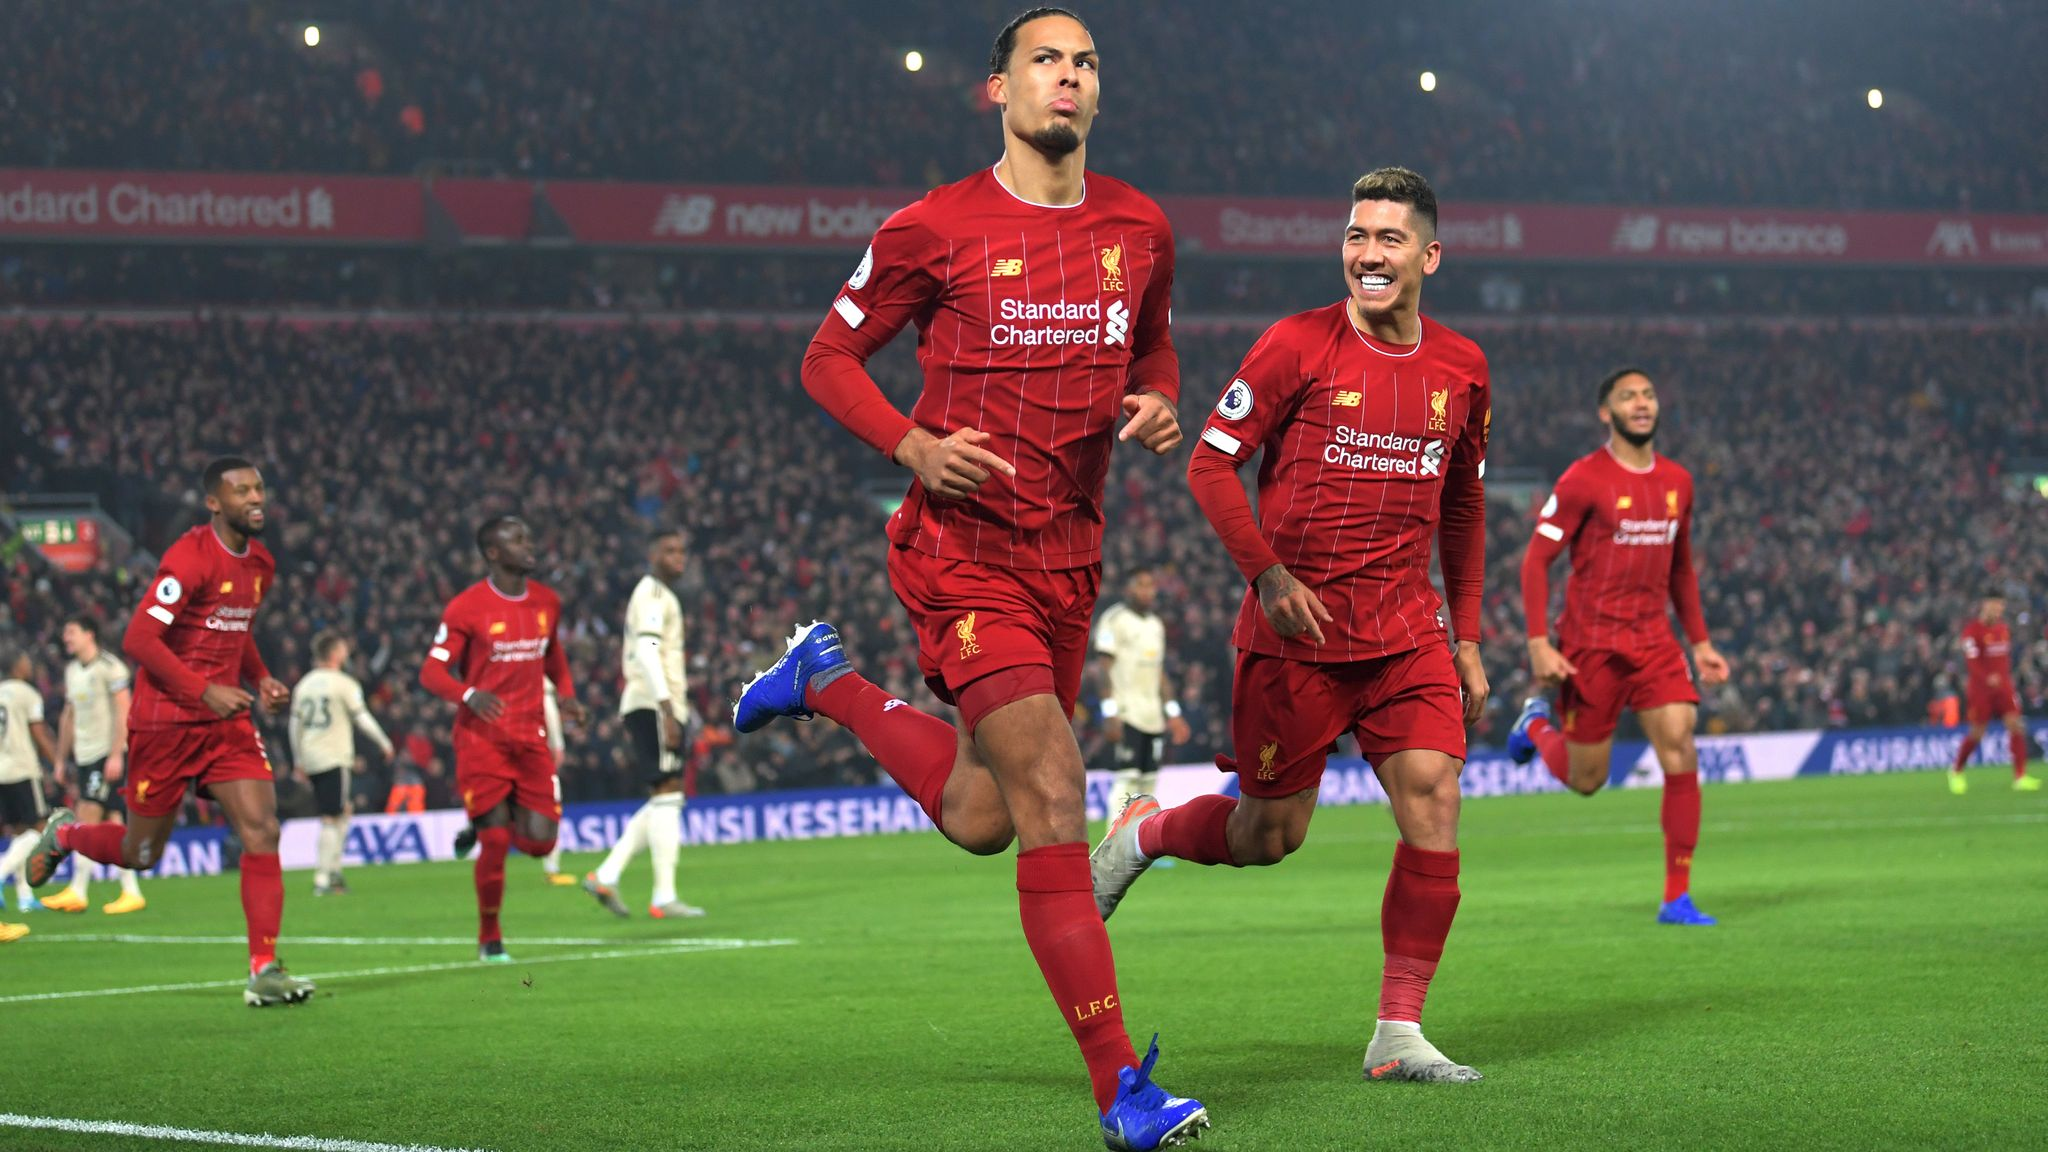 Liverpool 2-0 Manchester United player ratings: Jordan Henderson and Georginio Wijnaldum star